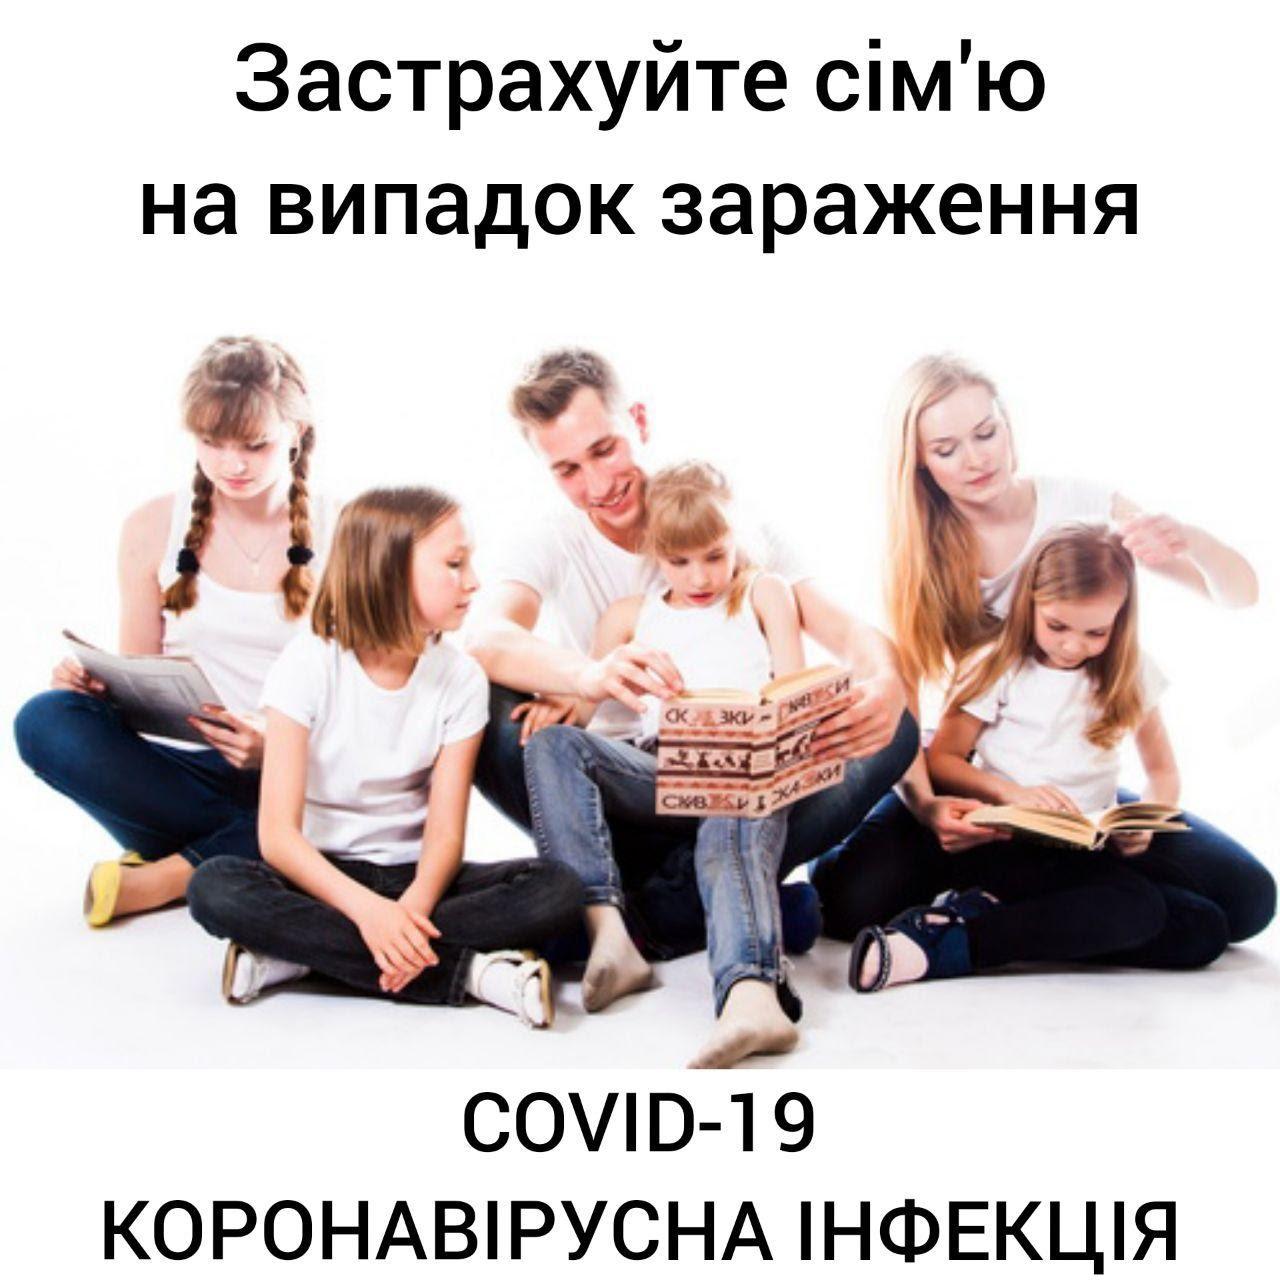 коронавирус, страховка, ХЕАГЛОБЕ, Тимур Уваровит, застраховаться, страхование жизни